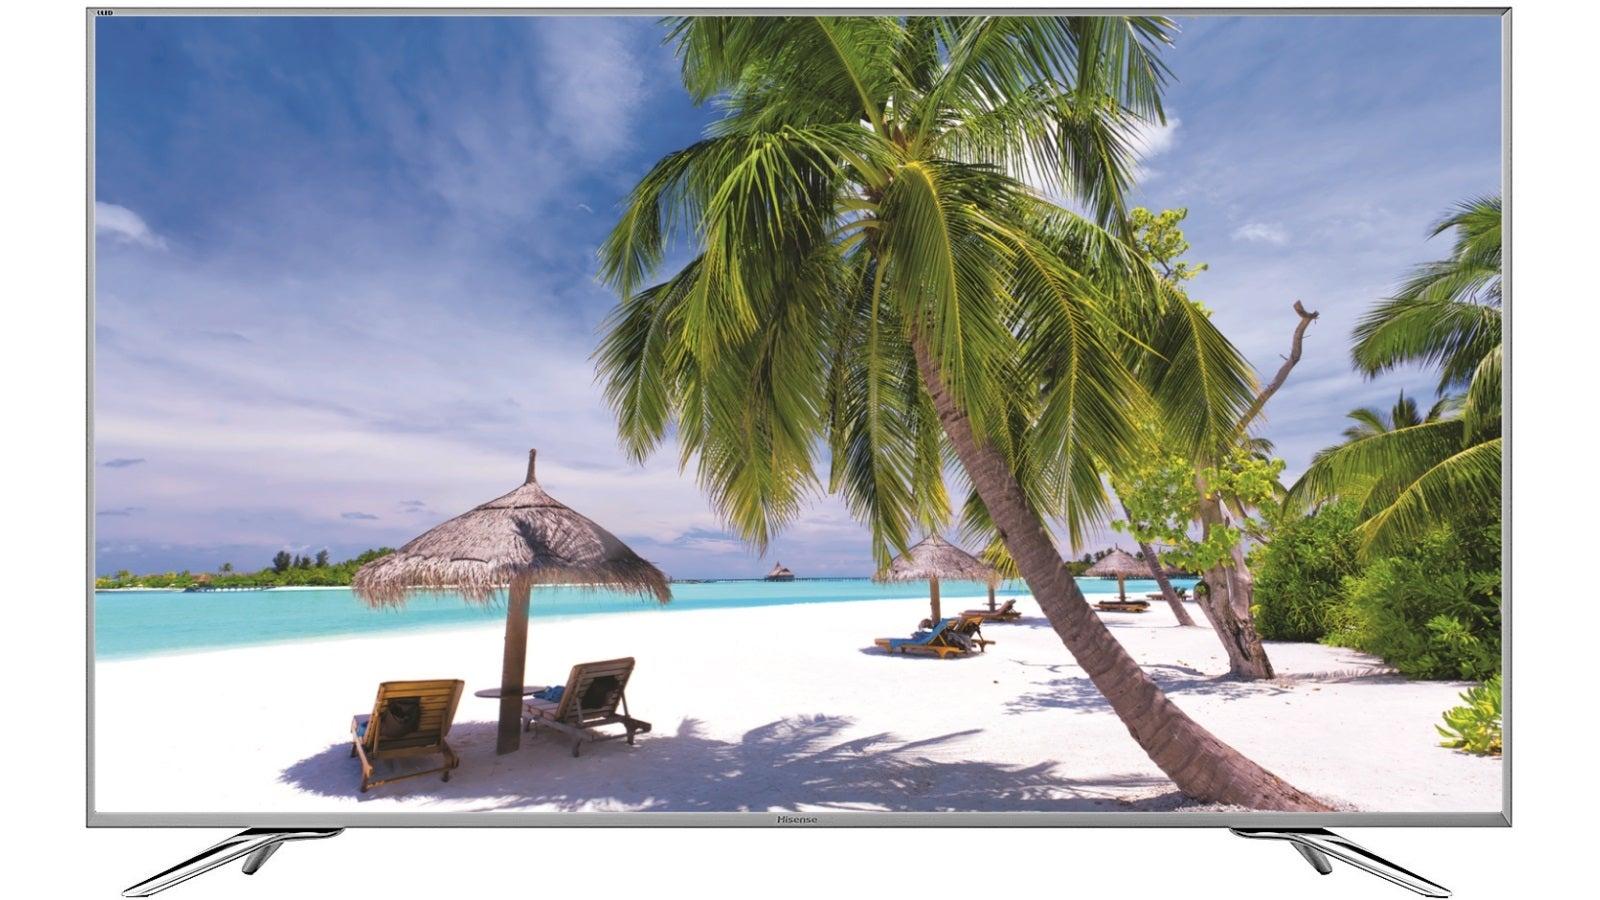 Hisense 55P7 55inch UHD LED LCD TV